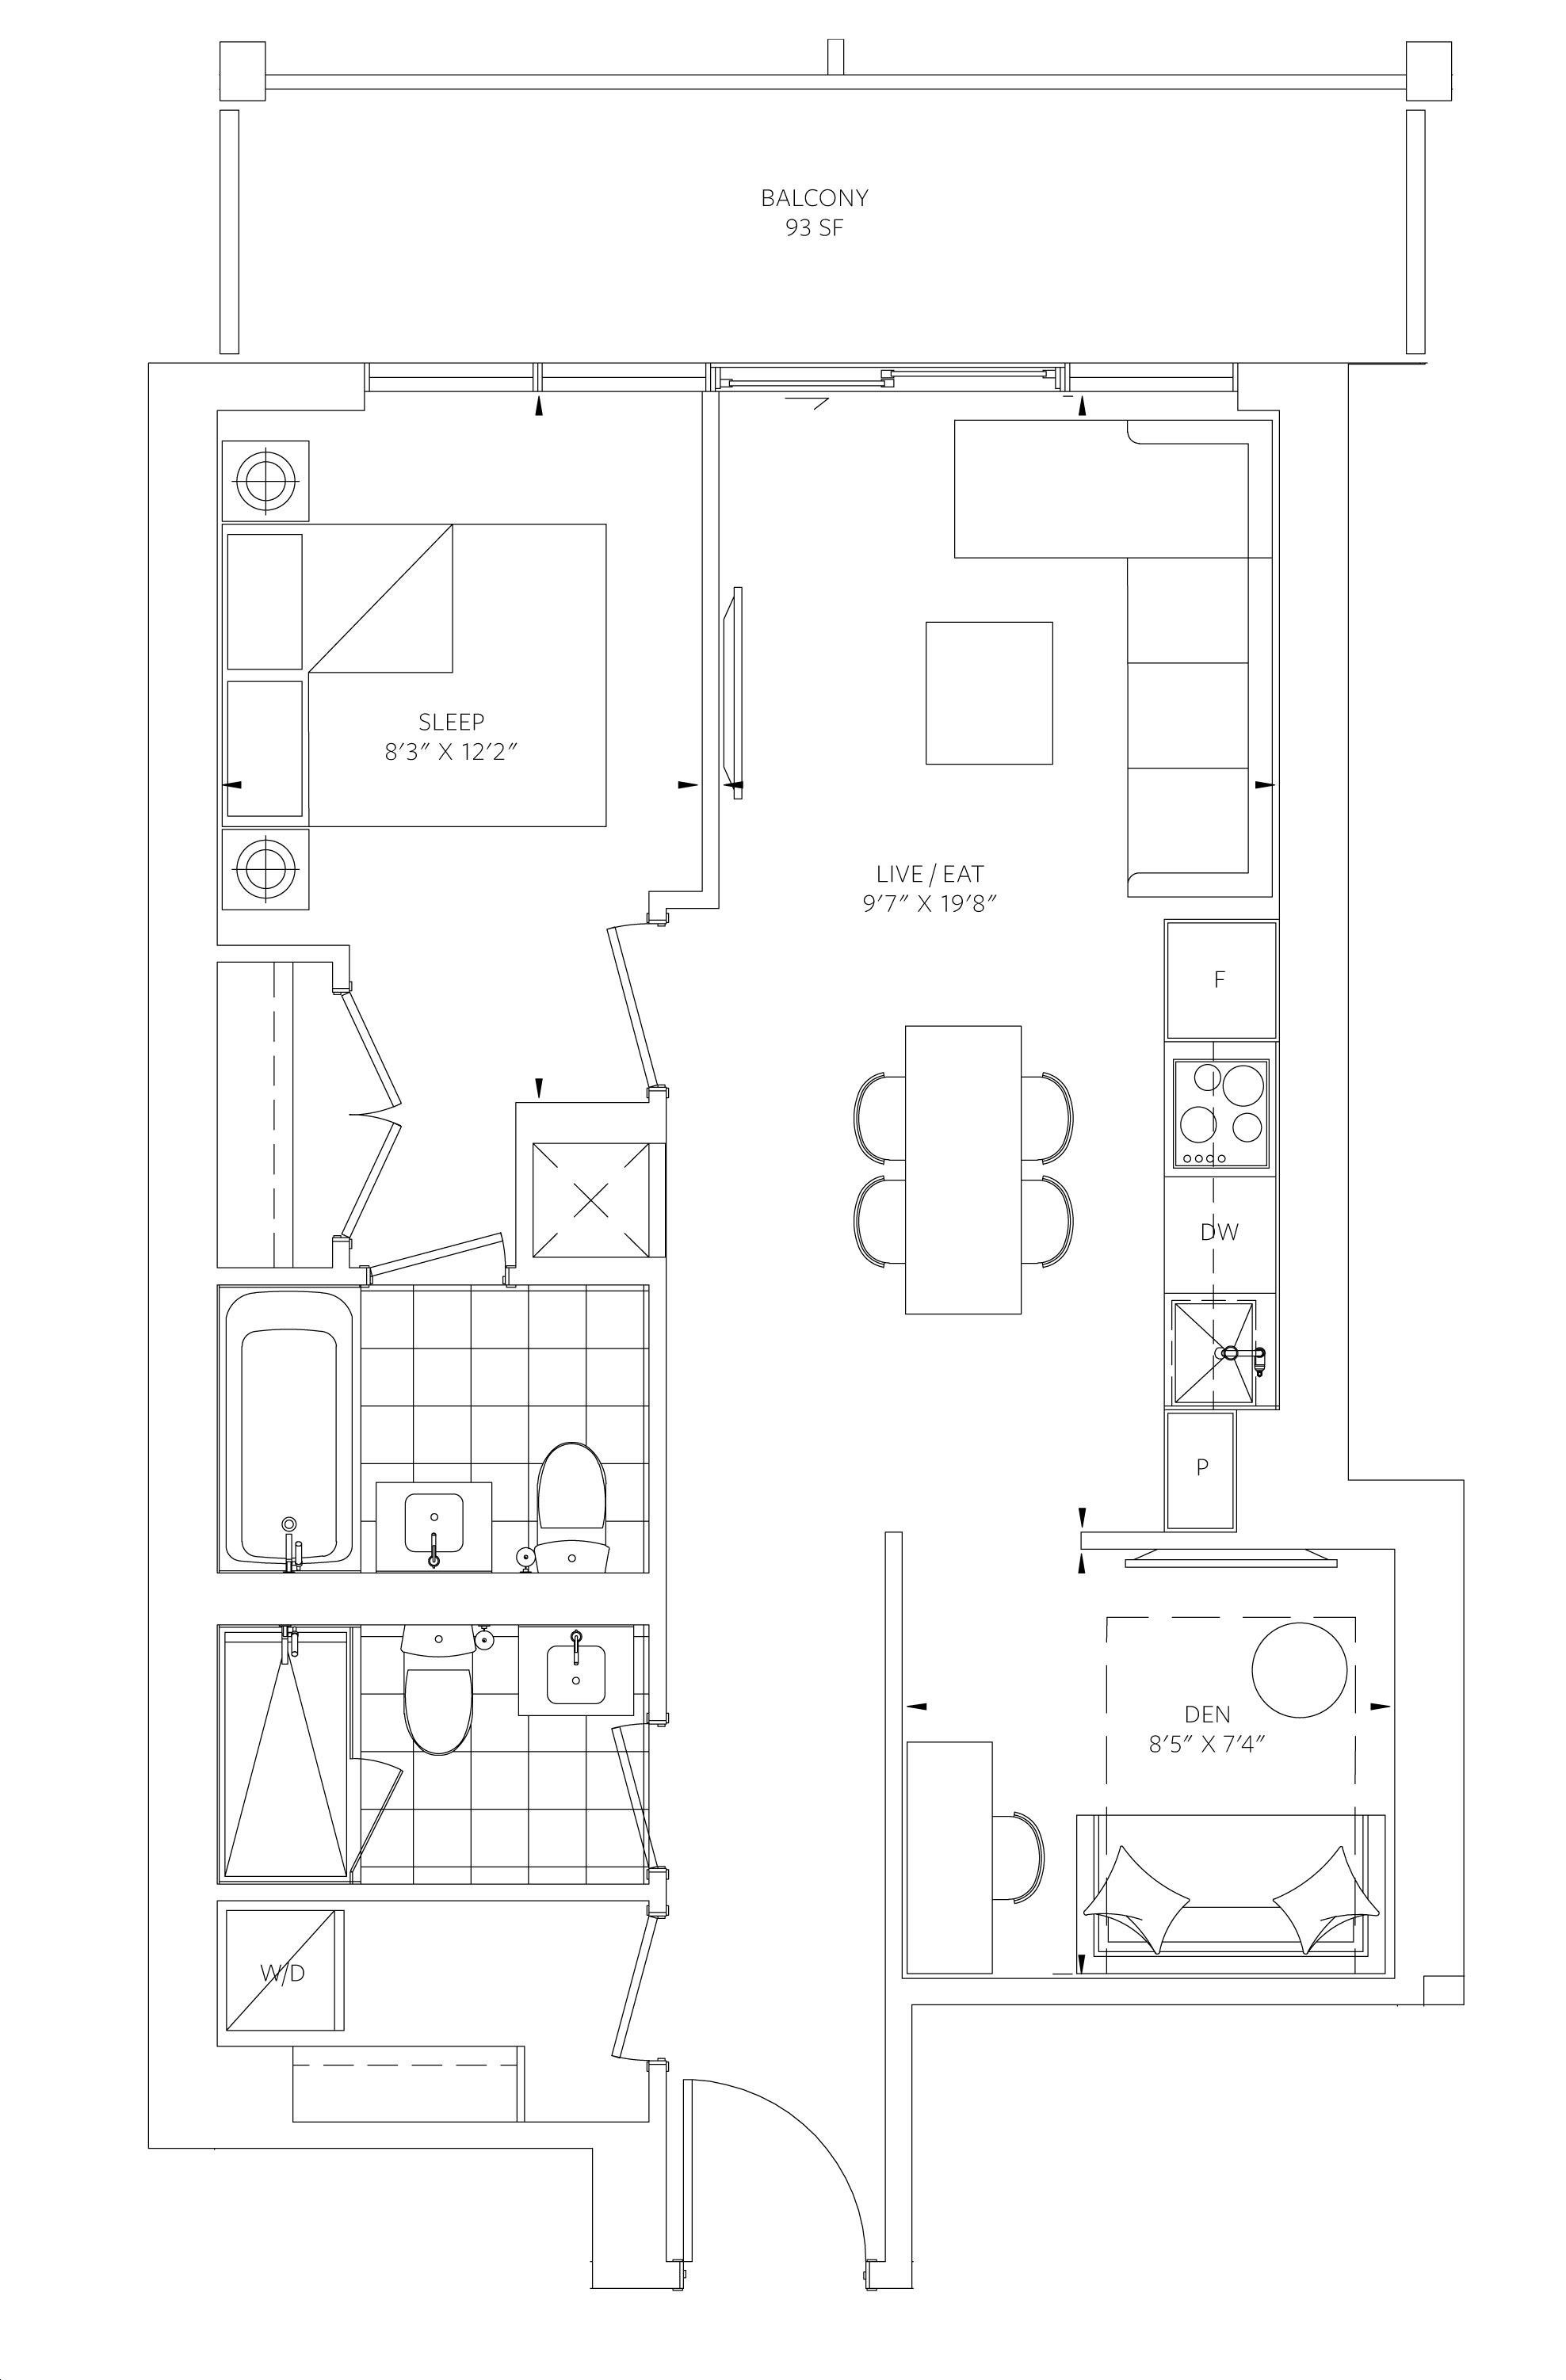 88 Queen Condos By St Thomas Development B2 Floorplan 1 Bed 2 Bath